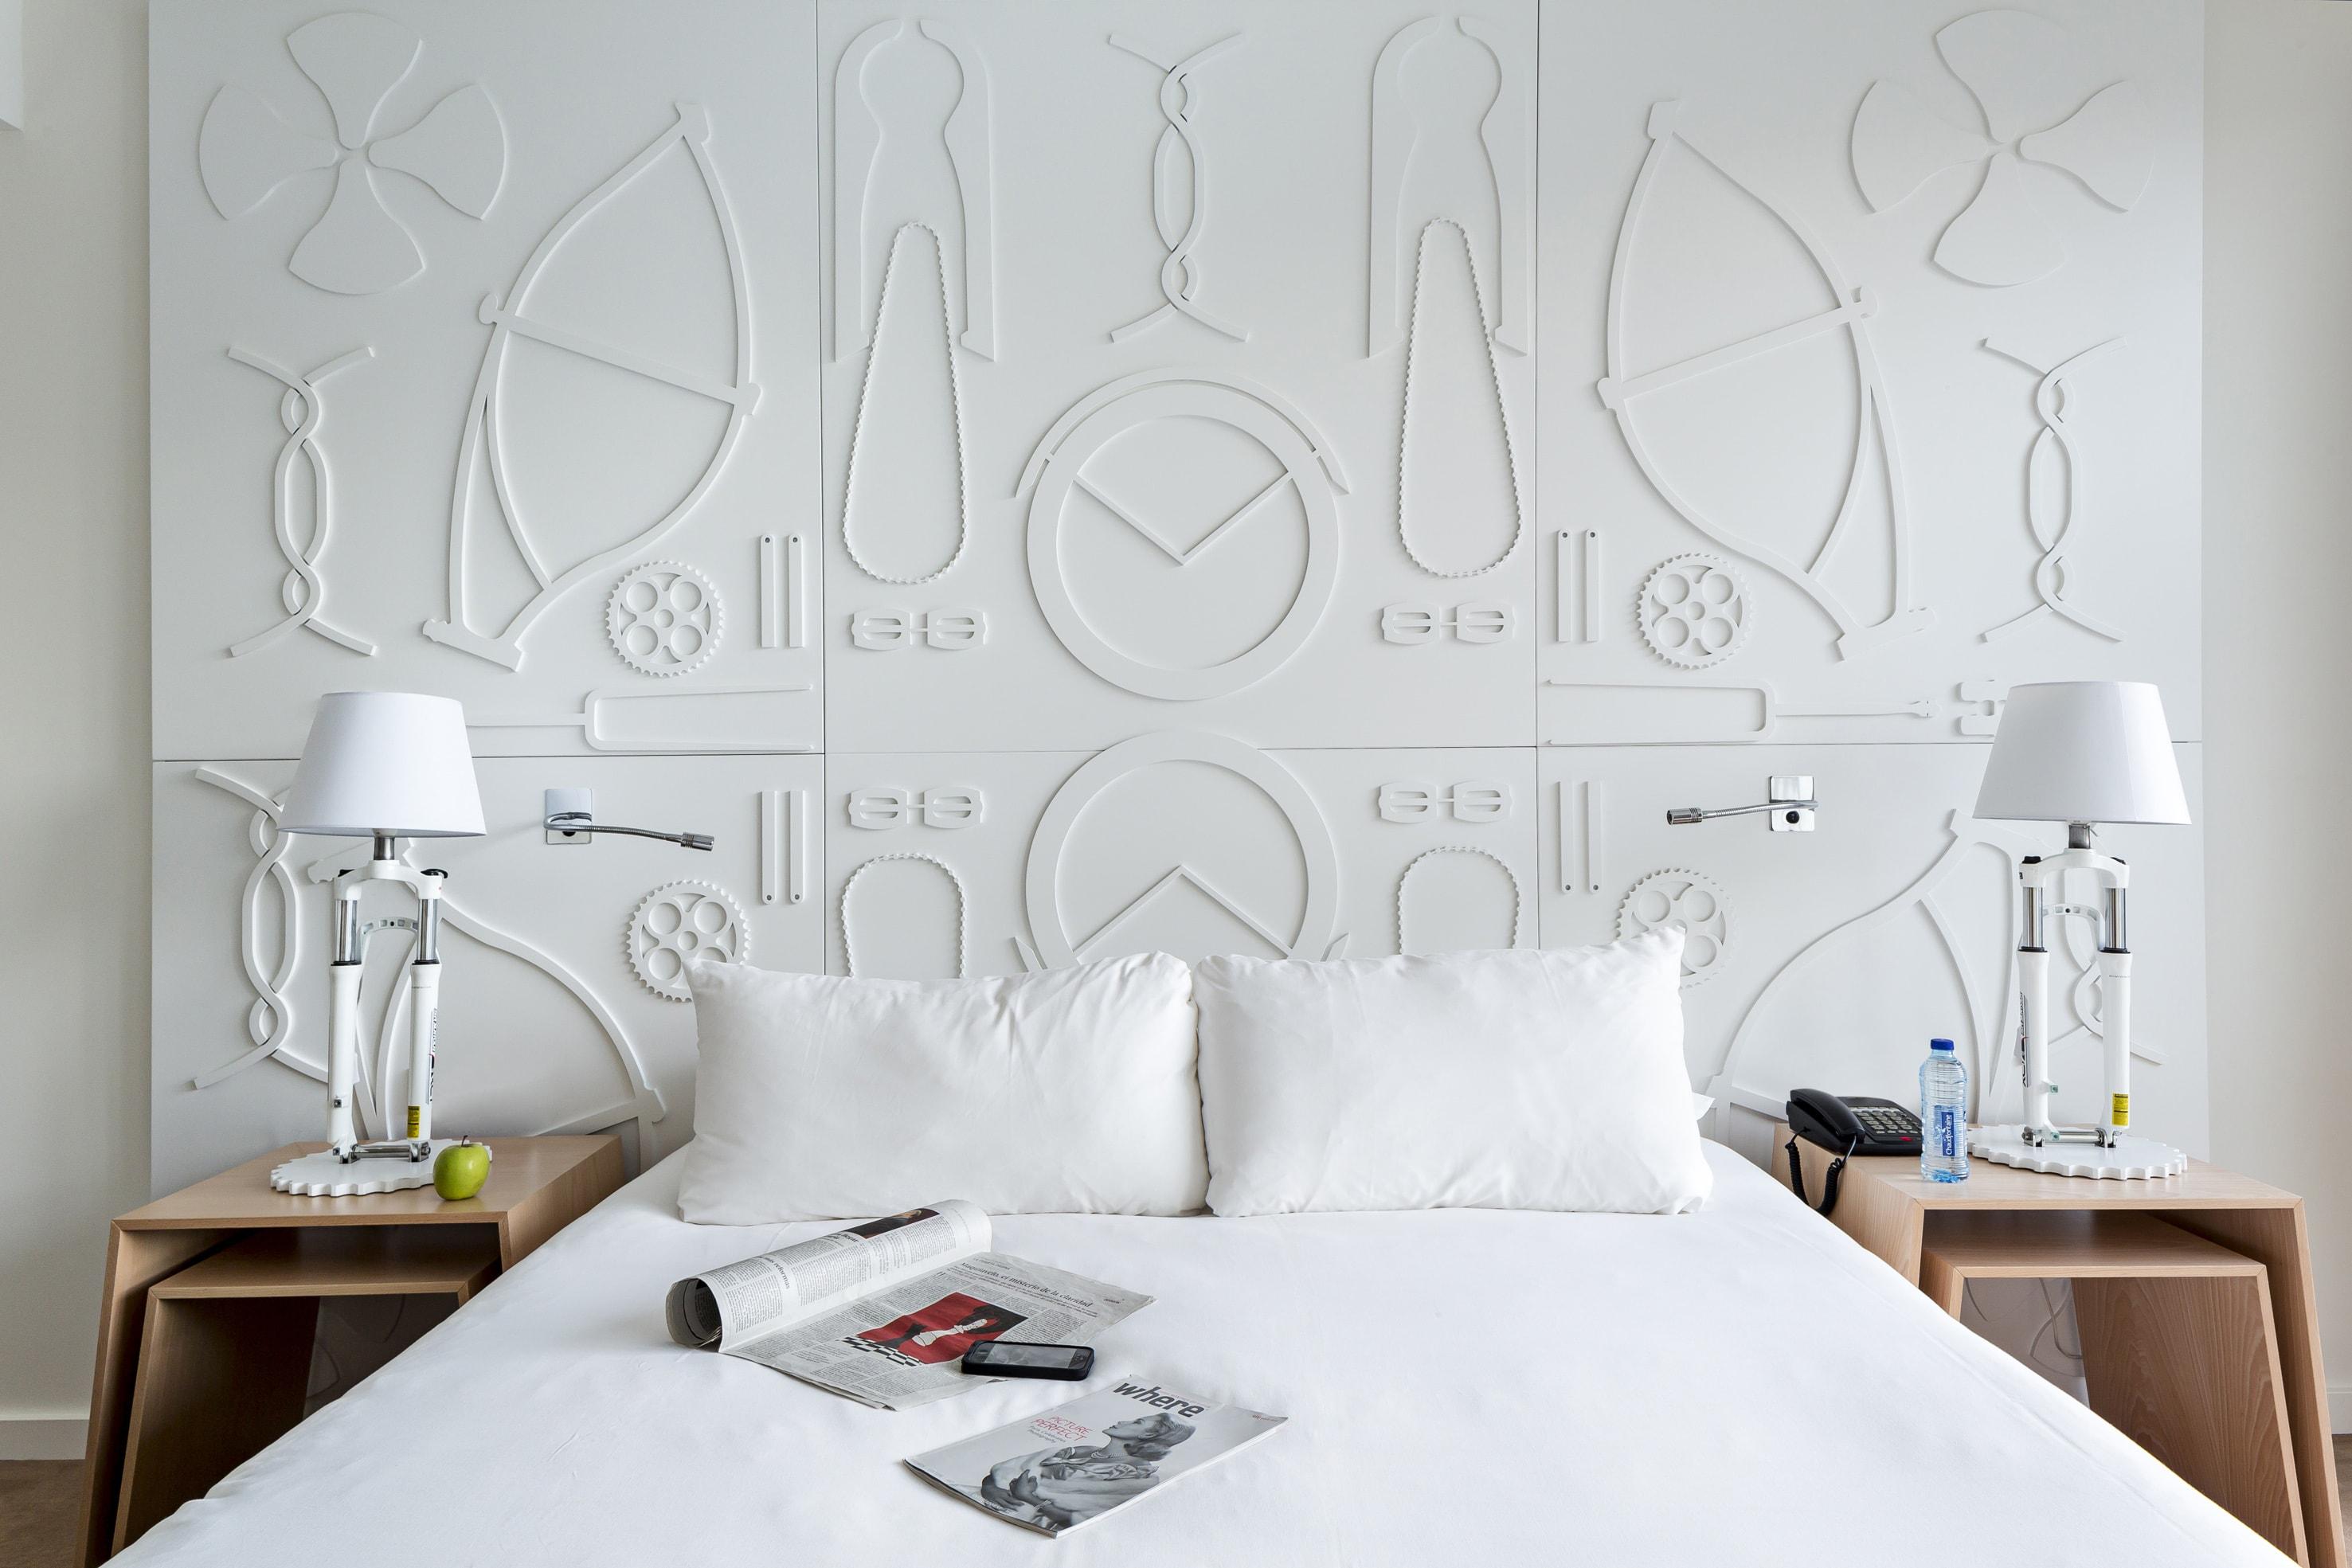 fabulous cabezales de cama originales cabecero with cabeceros de cama matrimonio originales with cabezales de cama caseros with cabeceros de cama de - Cabezales De Cama Caseros